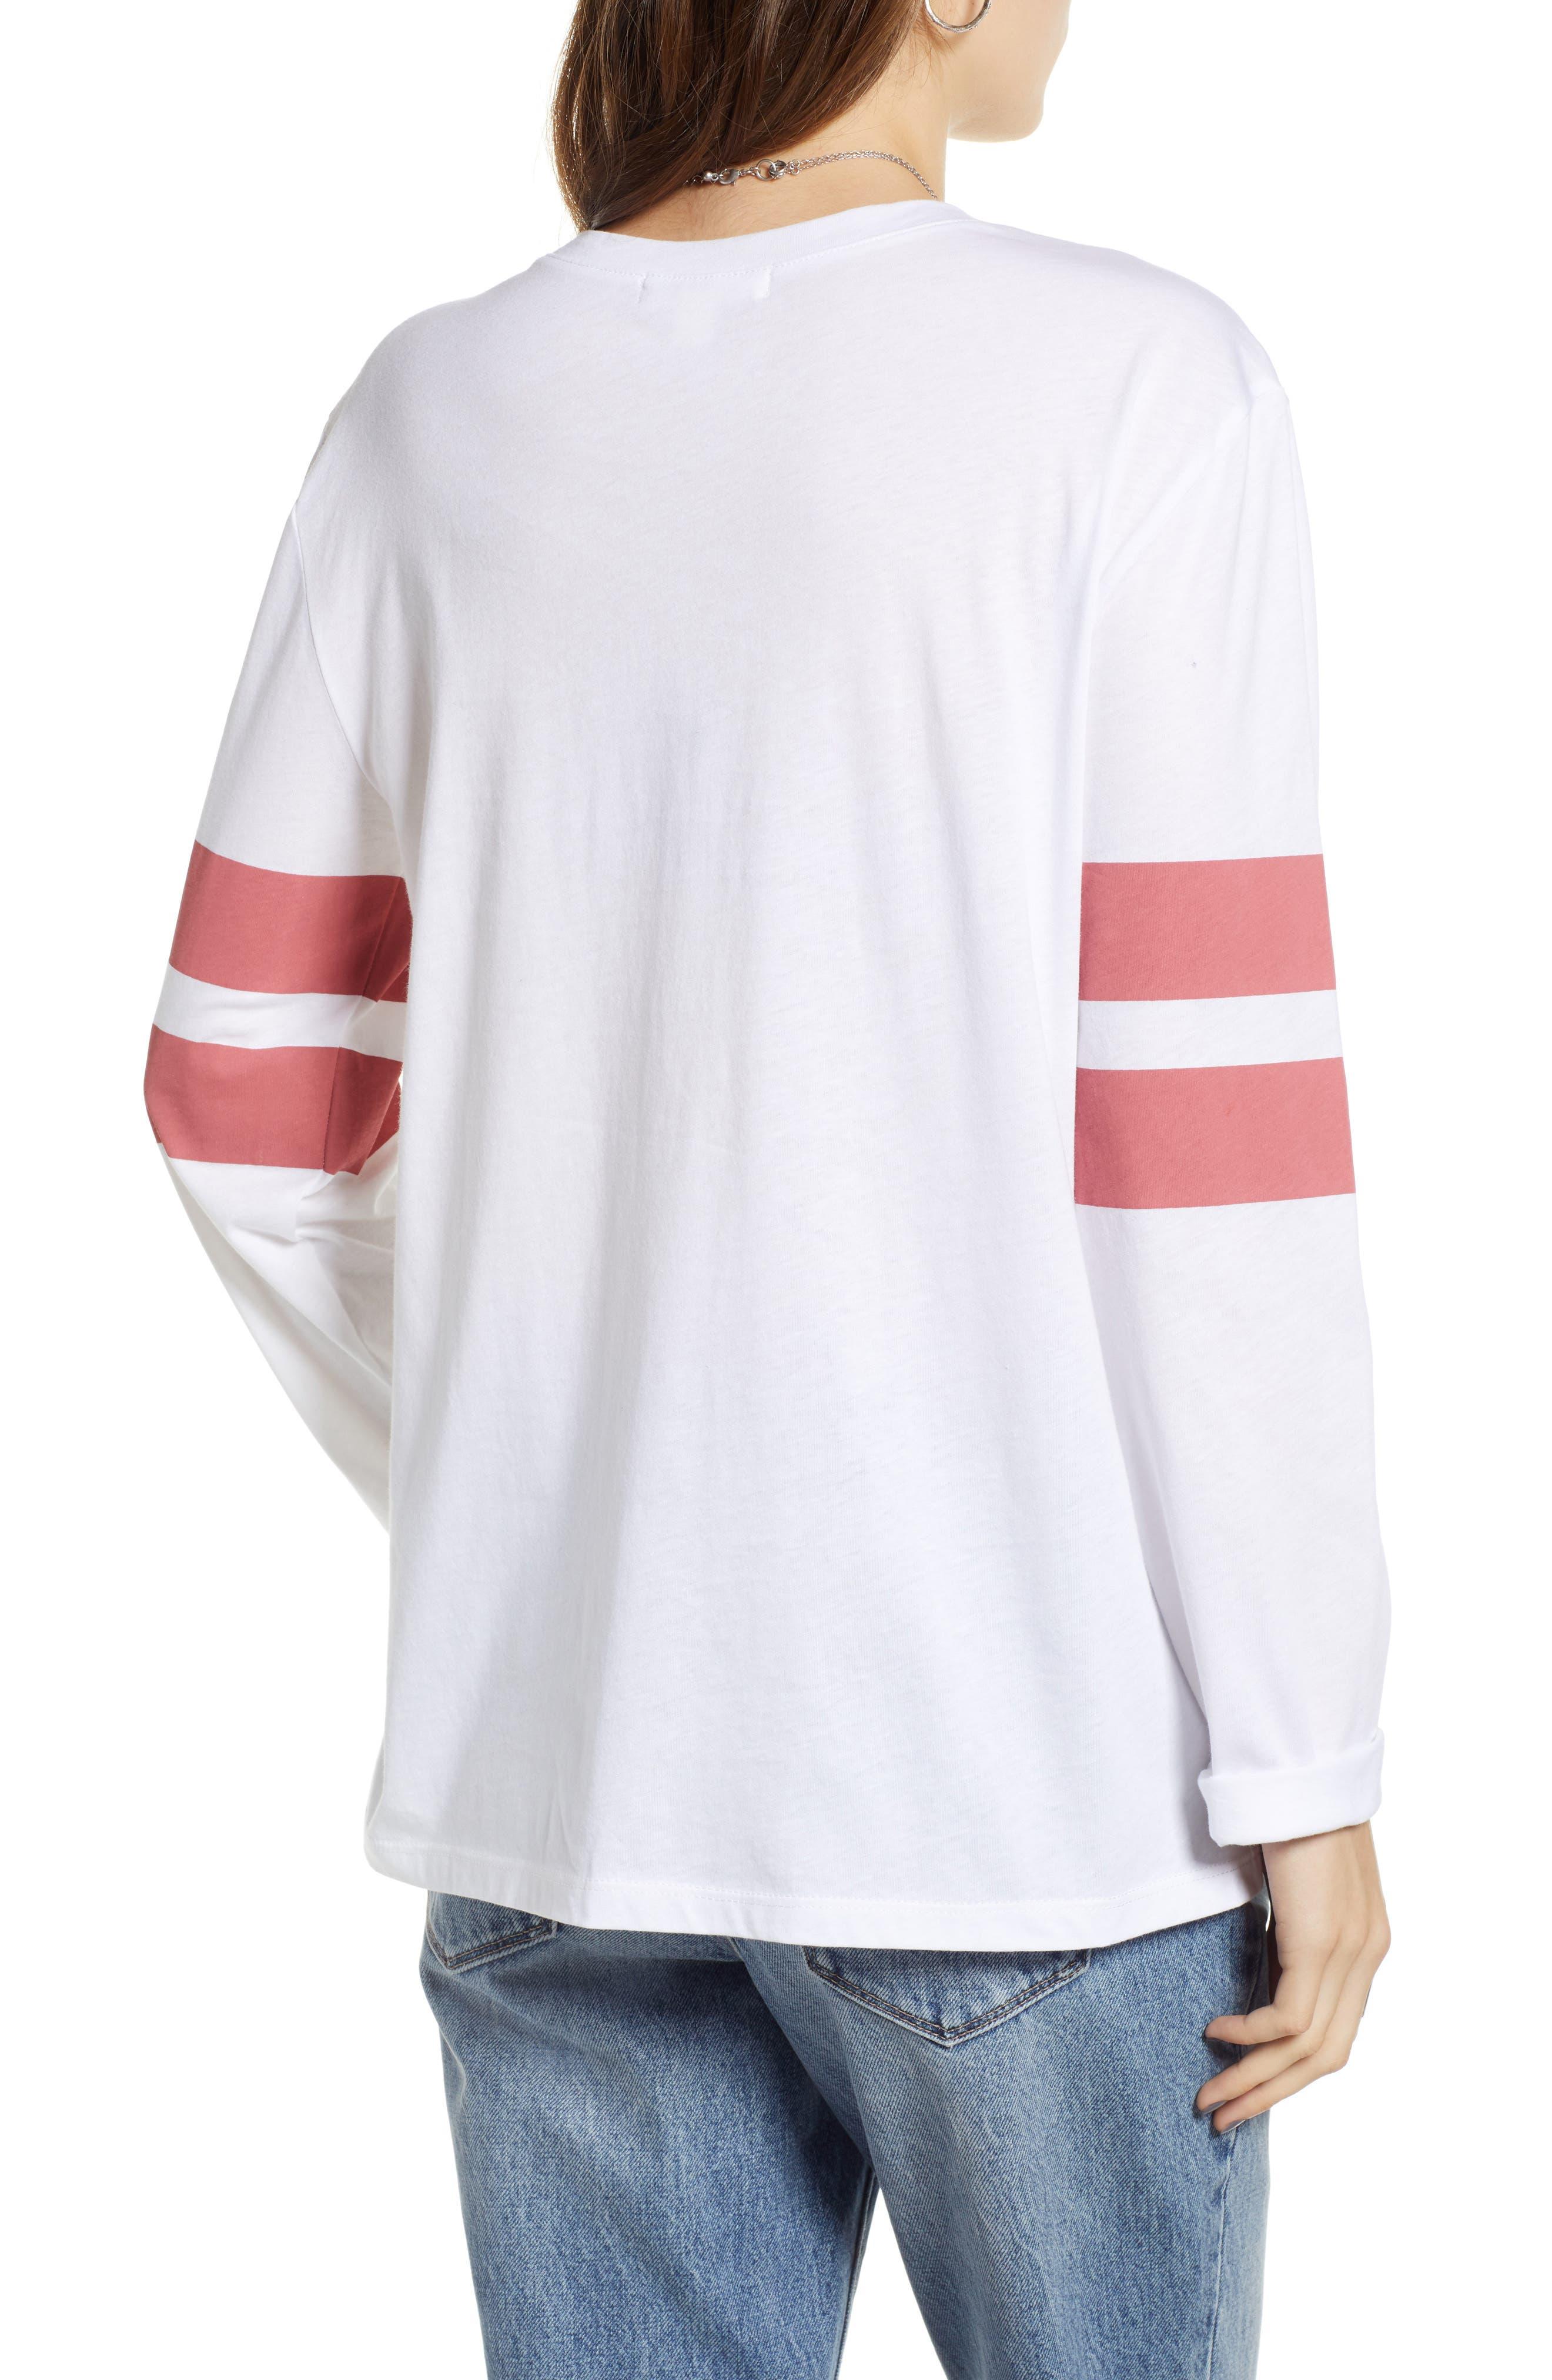 Varsity Stripe Tee,                             Alternate thumbnail 2, color,                             WHITE- RED BAROQUE COMBO